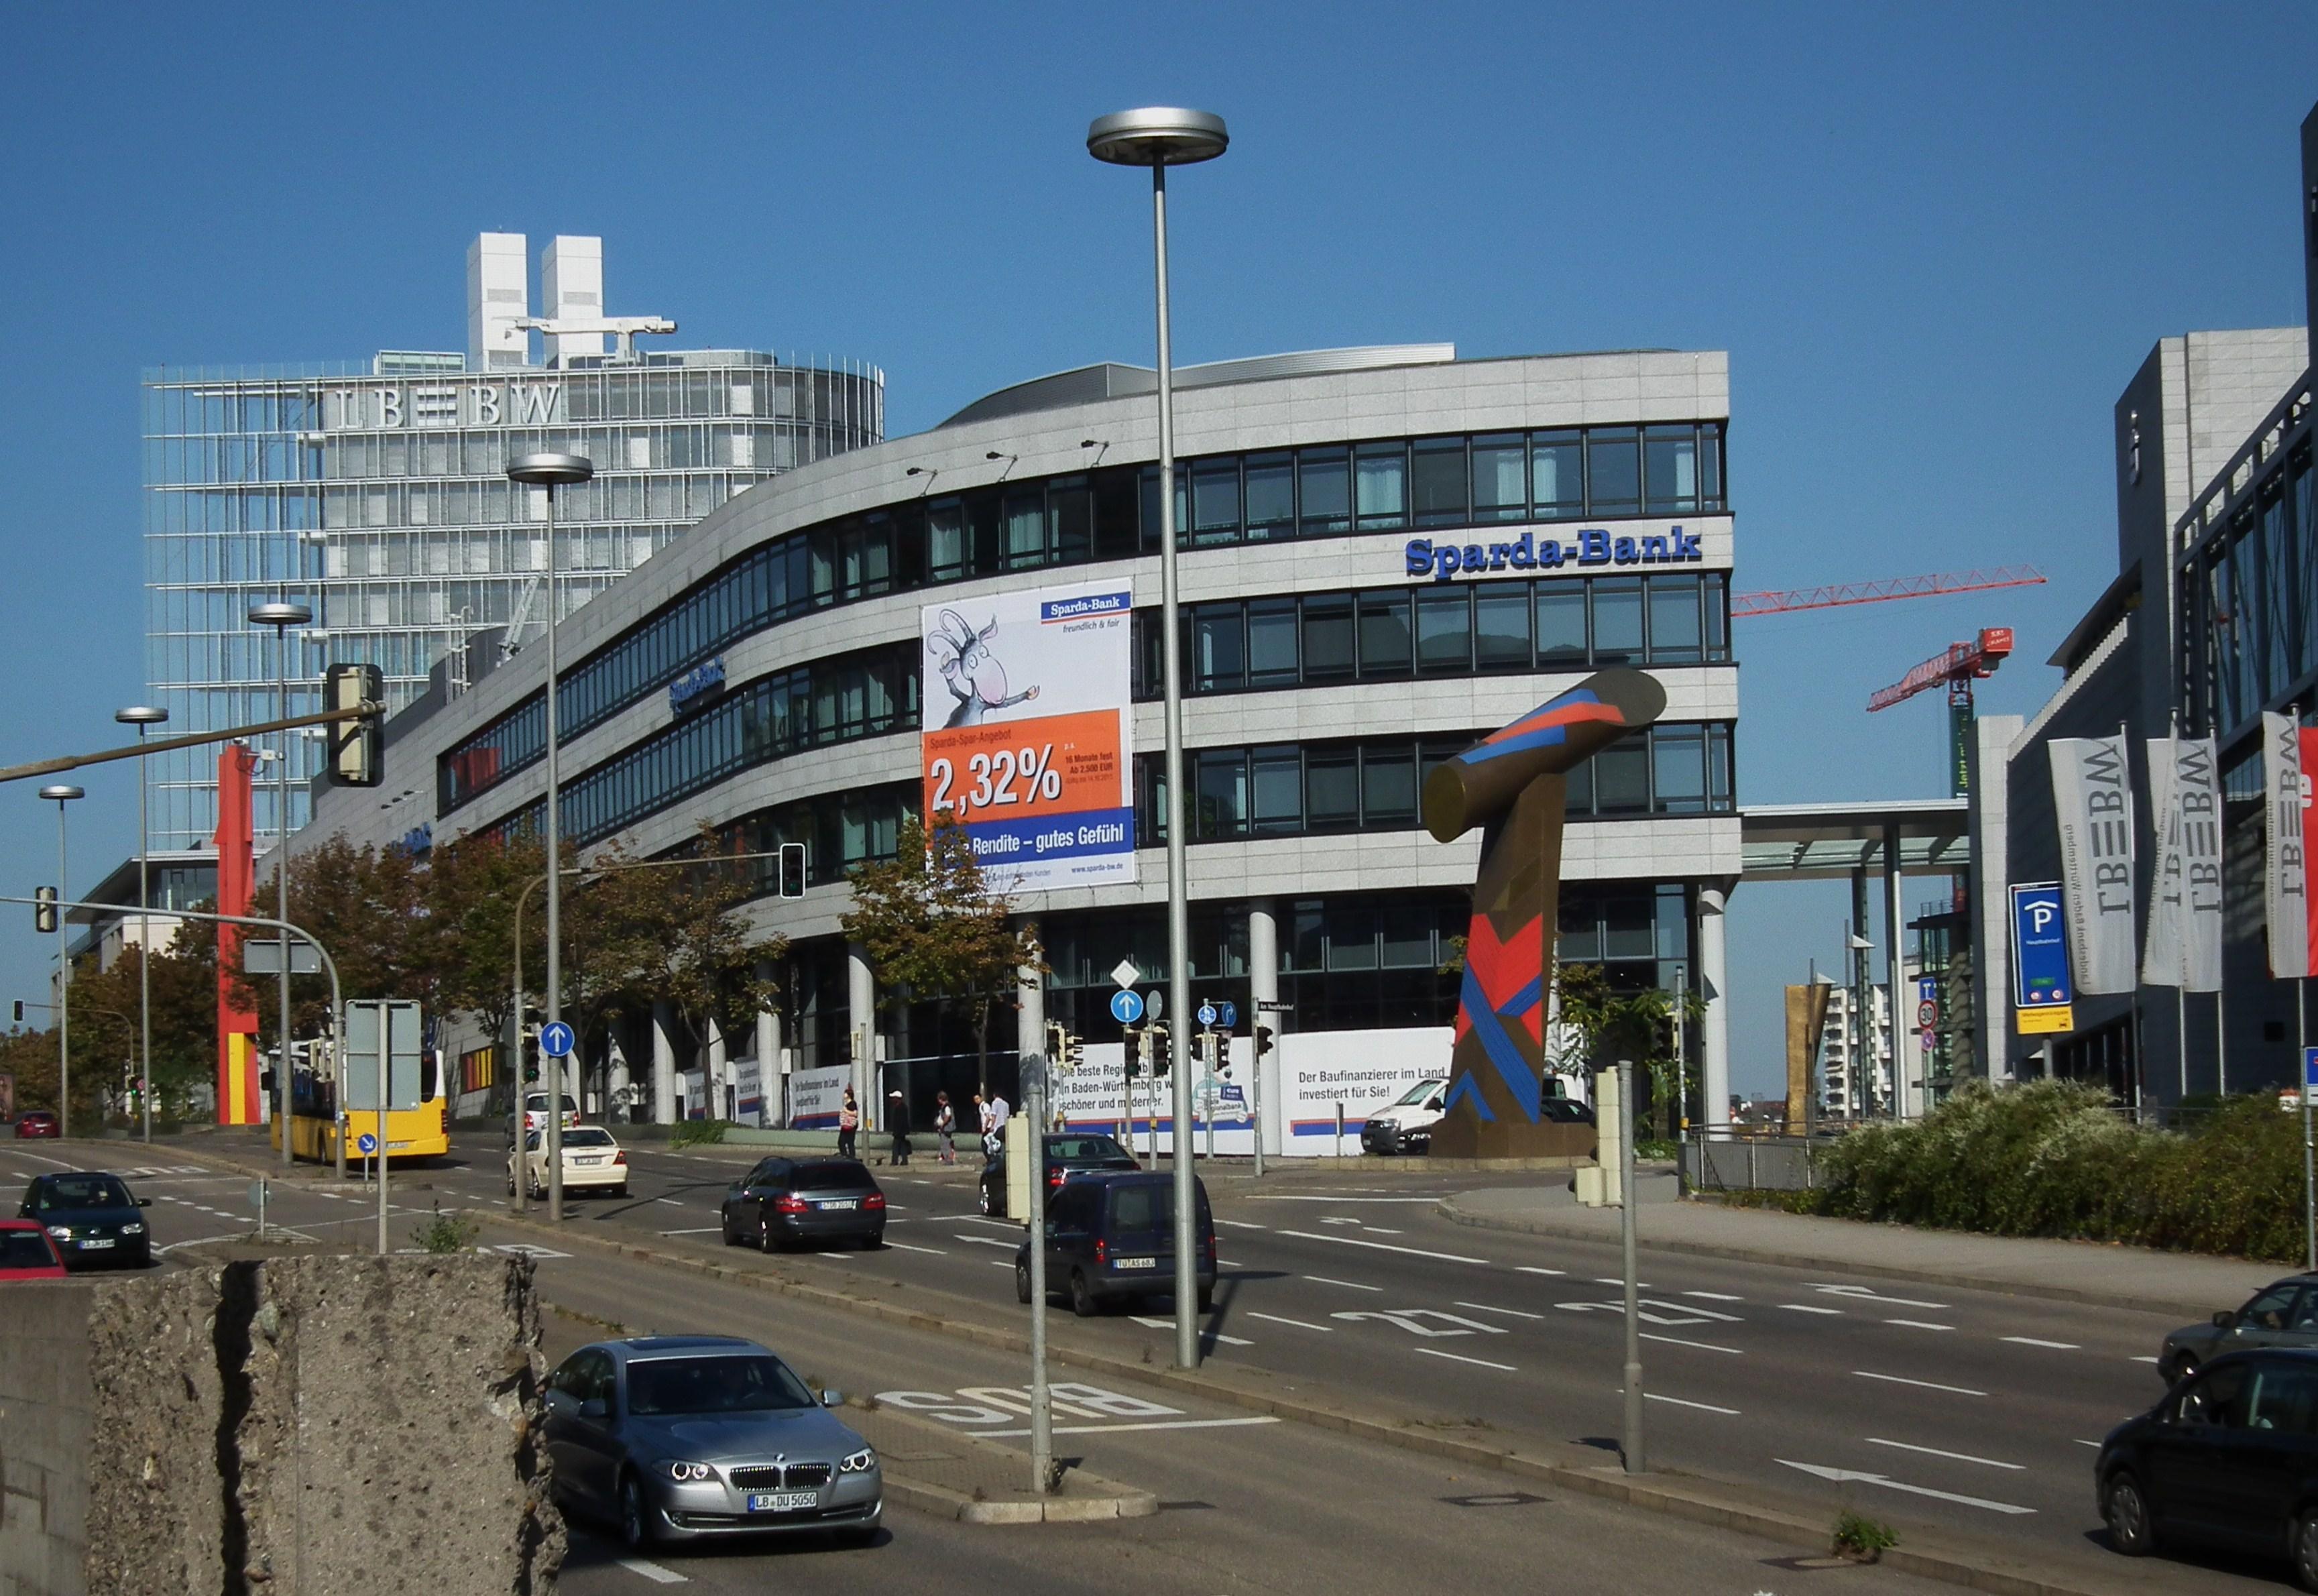 File:September 2011 Landesbank BW Und Sparda Bank